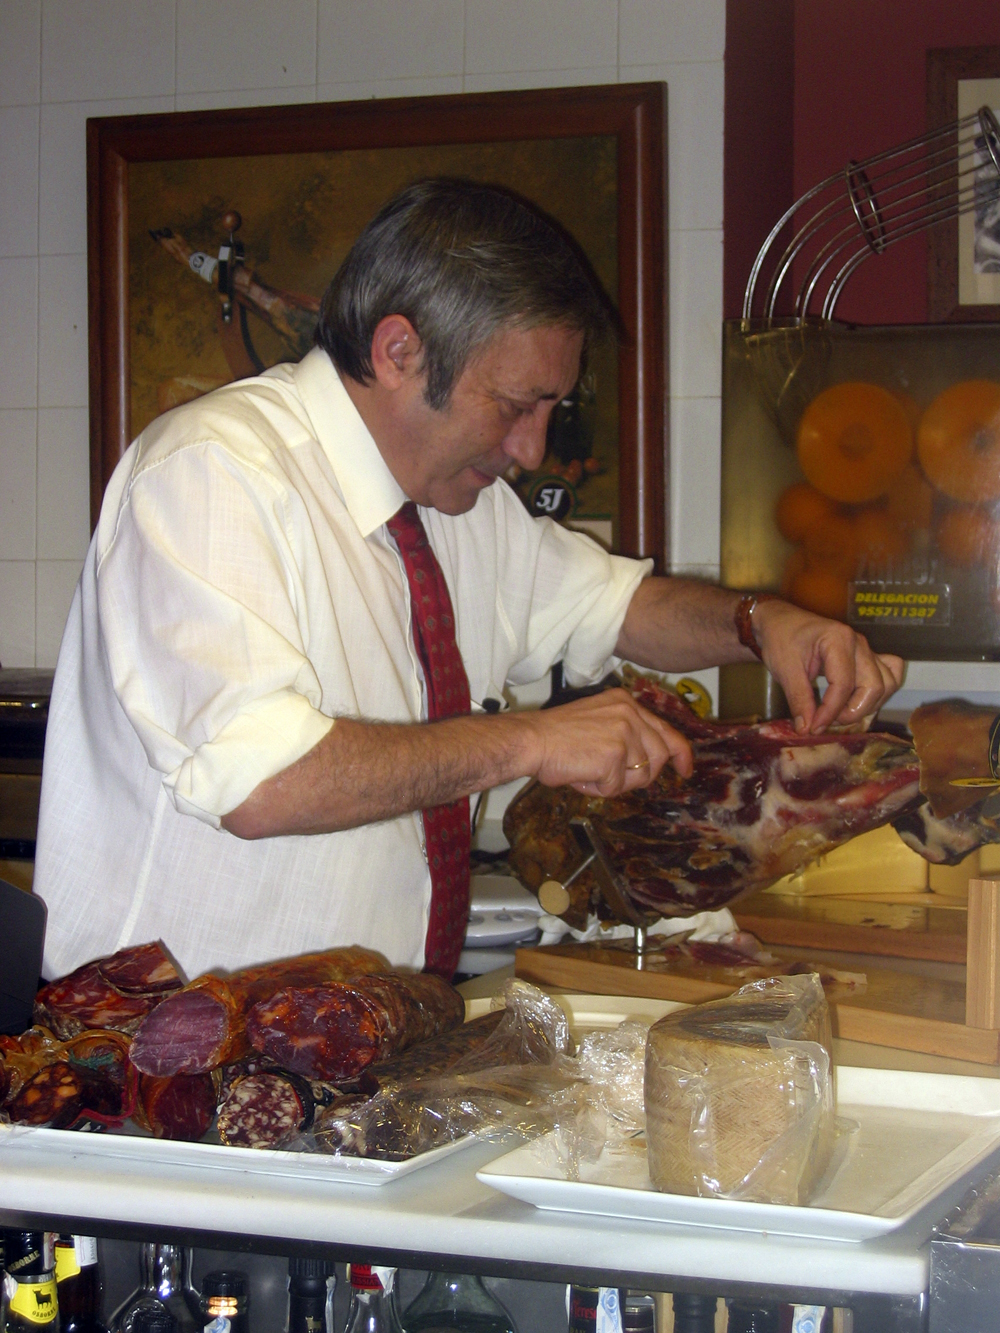 Andalucia Grisehistorie 0706 Skjærer